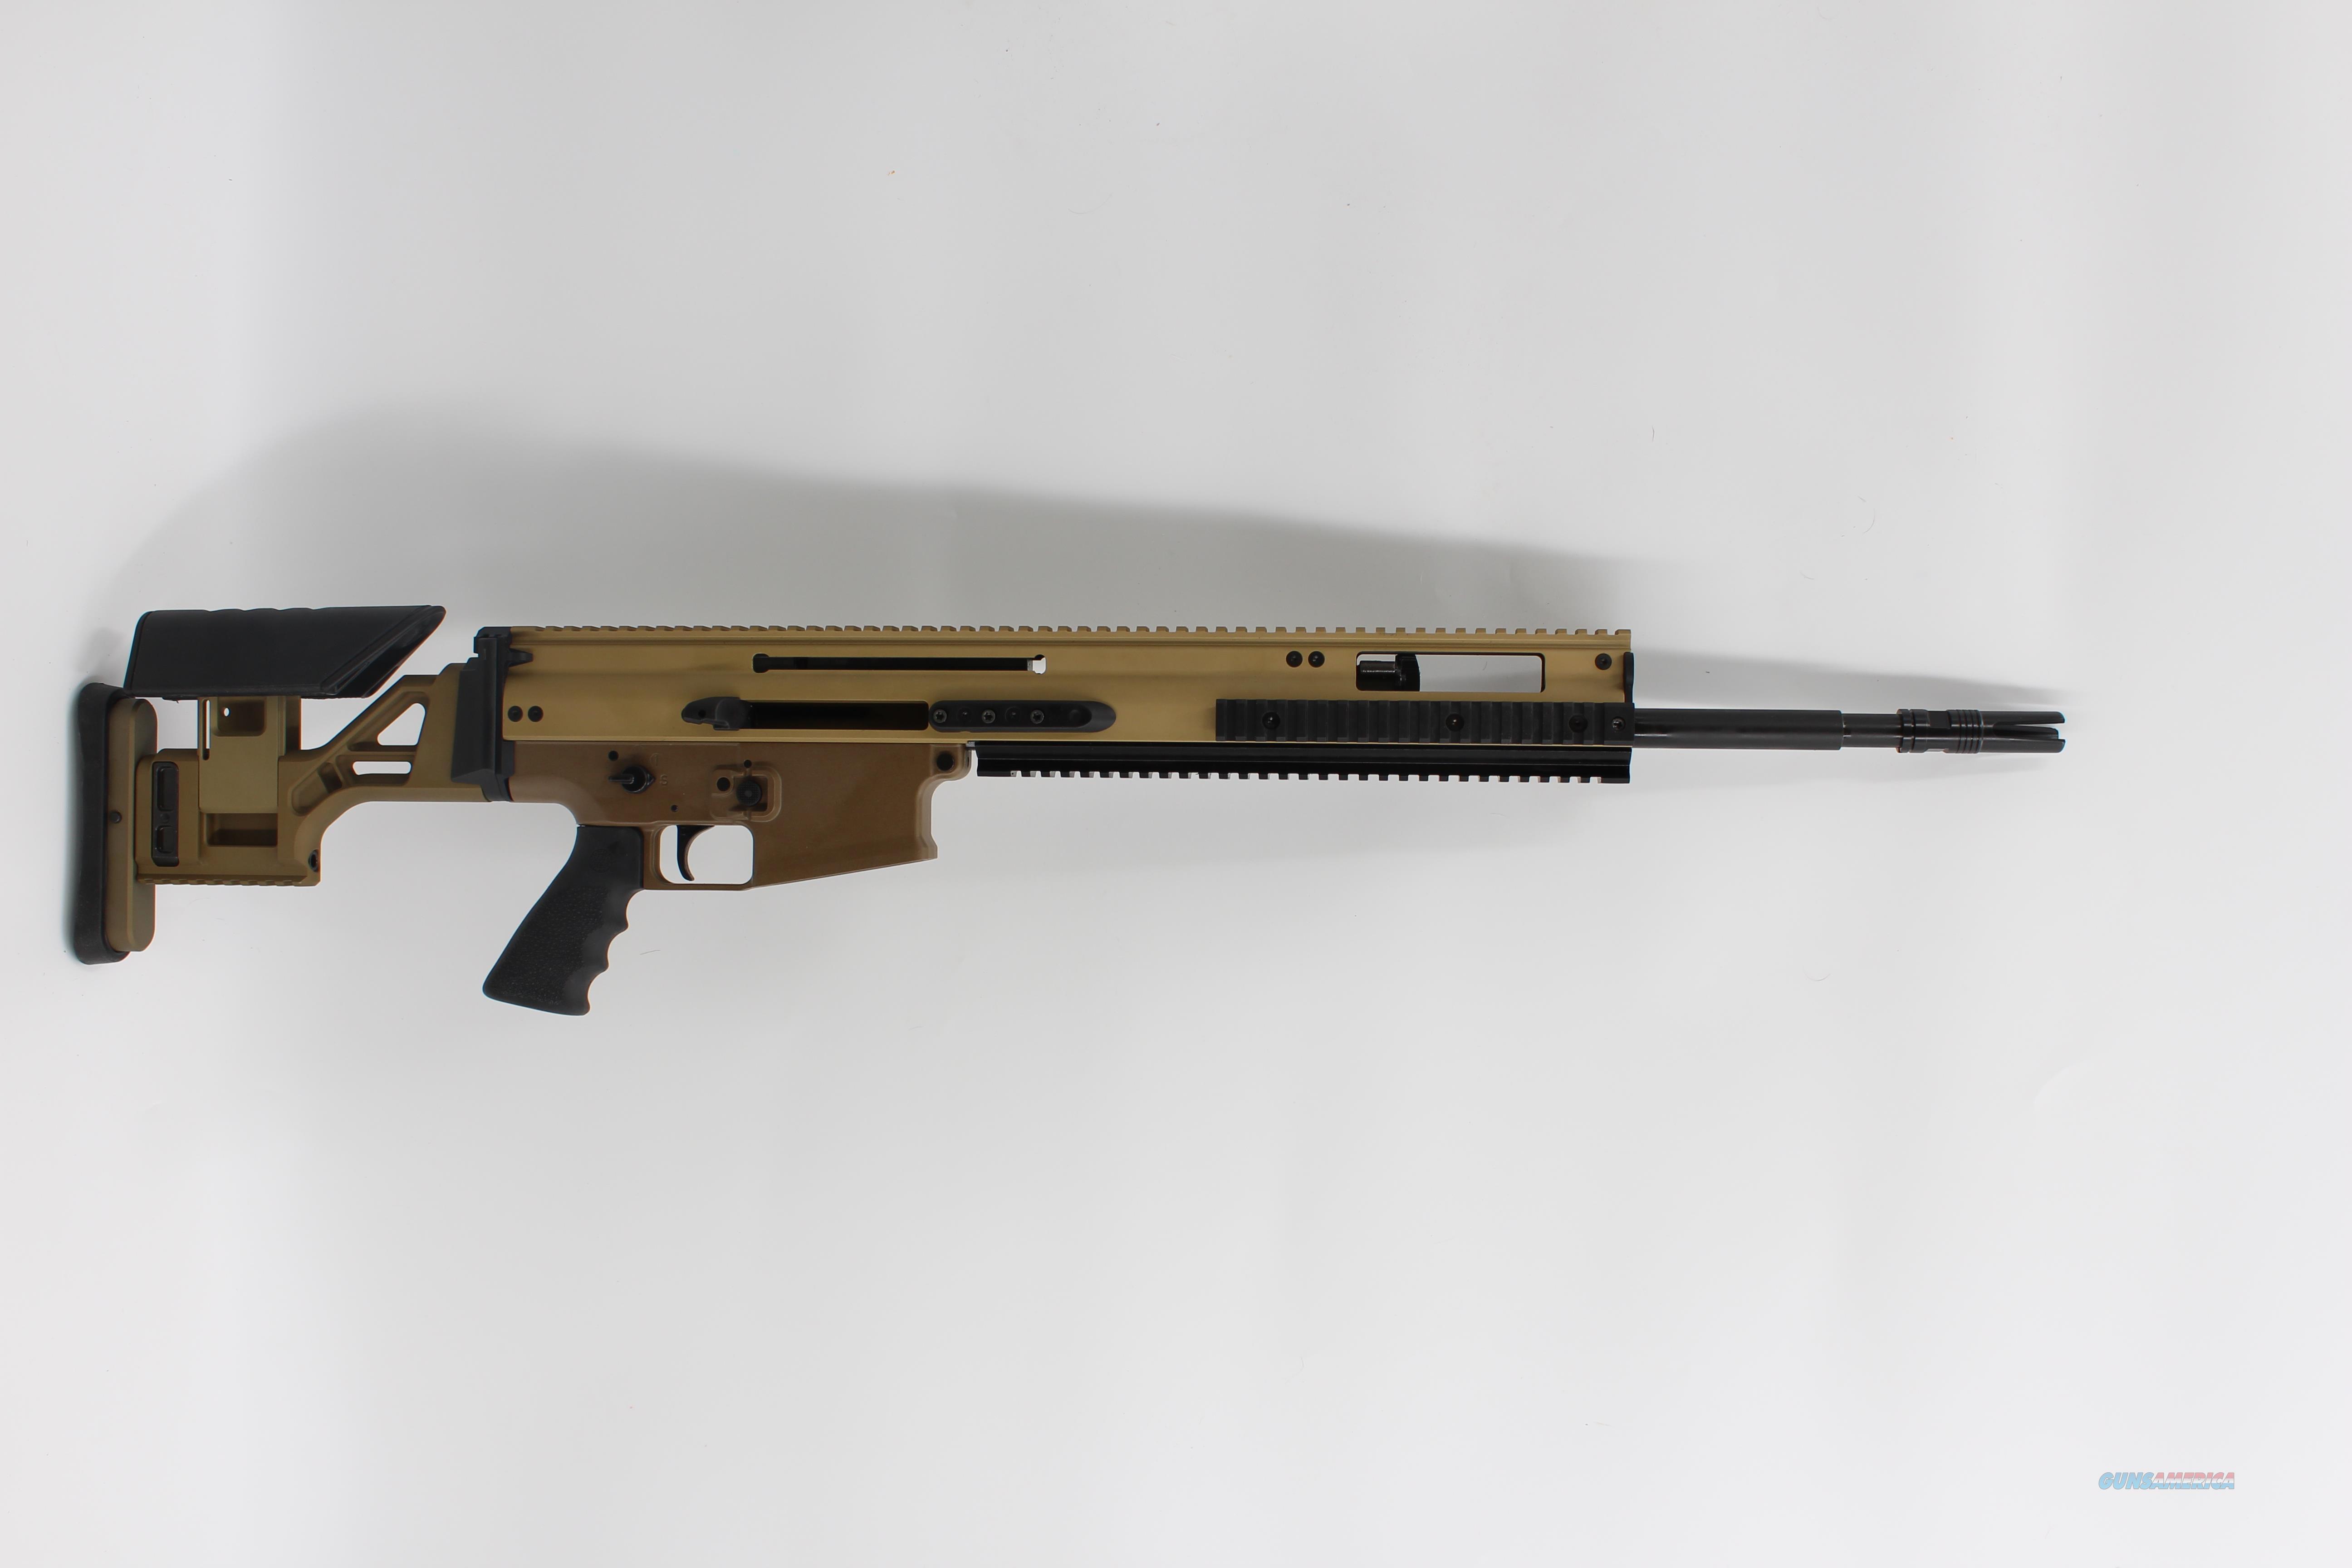 "FNH Scar 20S 308Win 20"" FREE SHIPPING  Guns > Rifles > FNH - Fabrique Nationale (FN) Rifles > Semi-auto > SCAR"